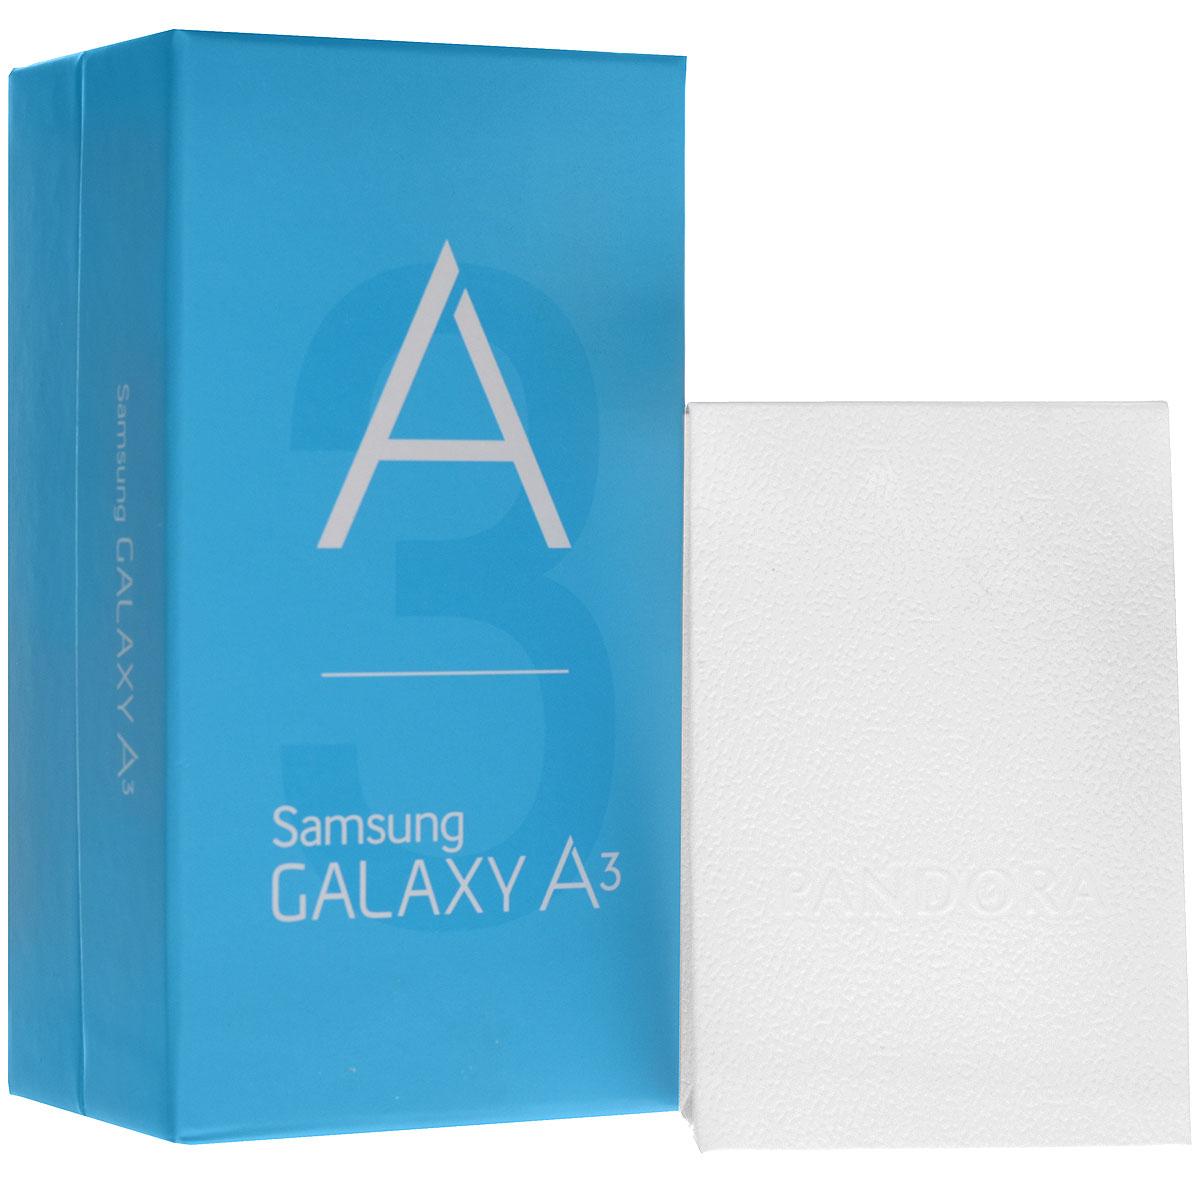 Samsung SM-A300F Galaxy A3, White + браслет Pandora ( F-A304FZWDSER )